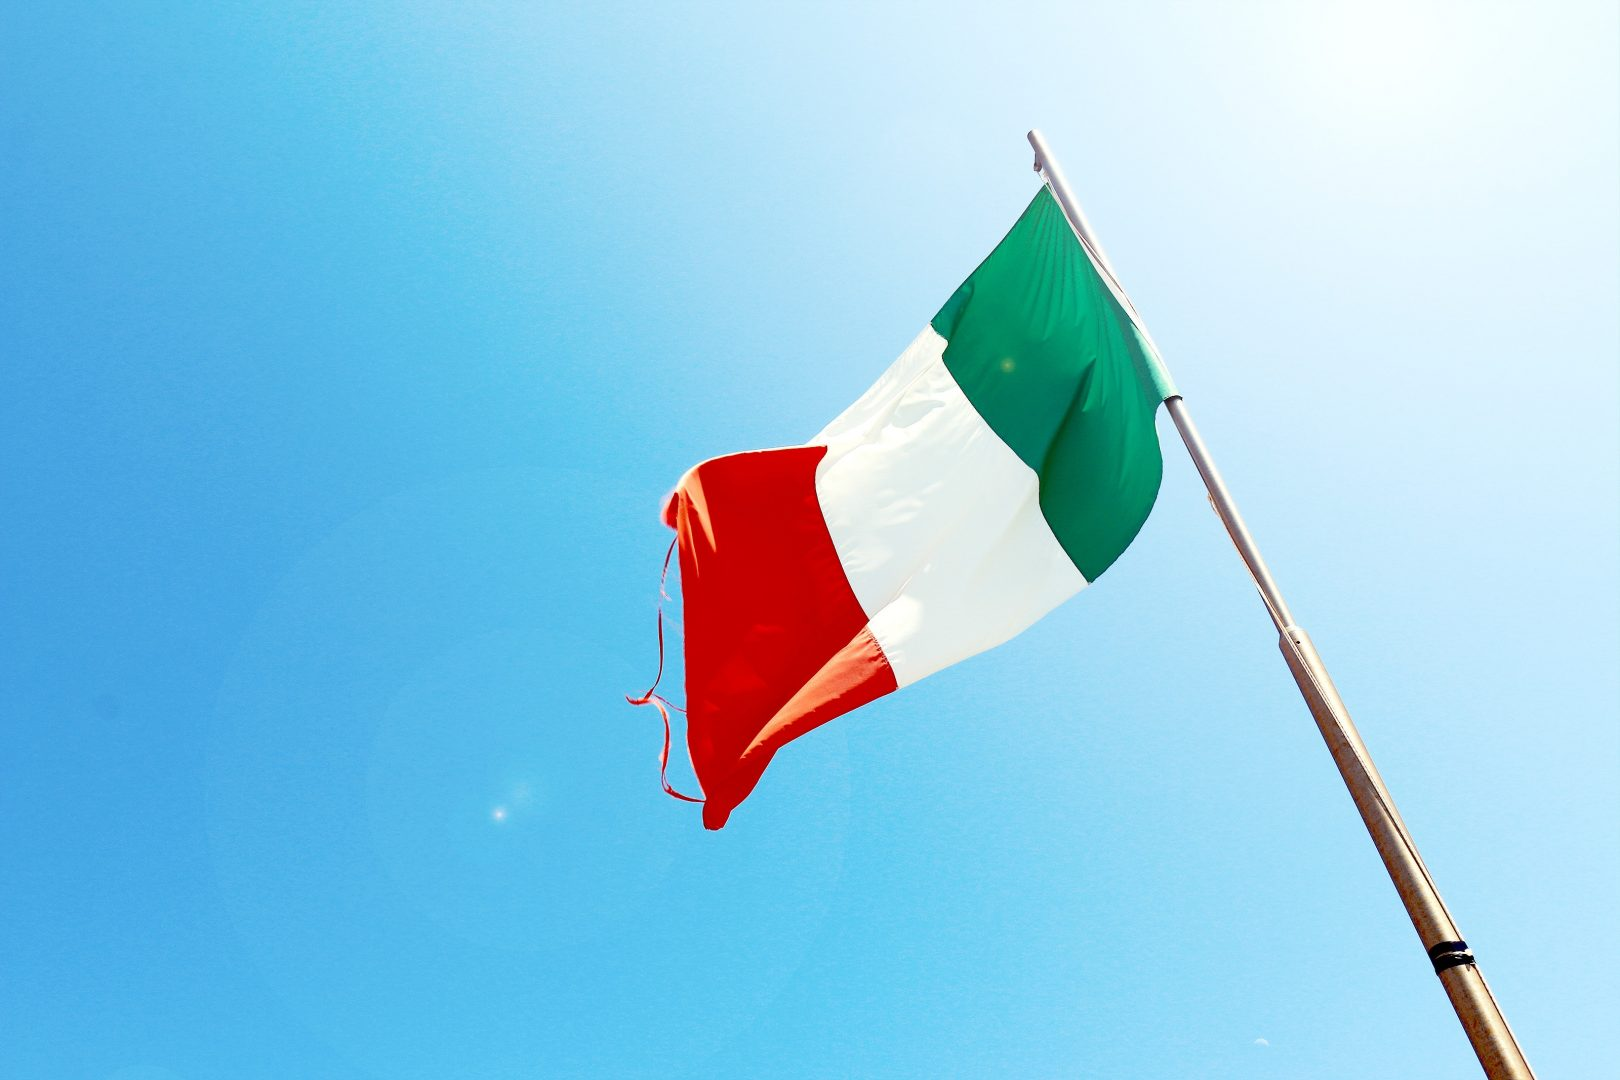 Гранд Тур по Италии на майские праздники 2019 с перелетом, экскурсиями от 733 евро